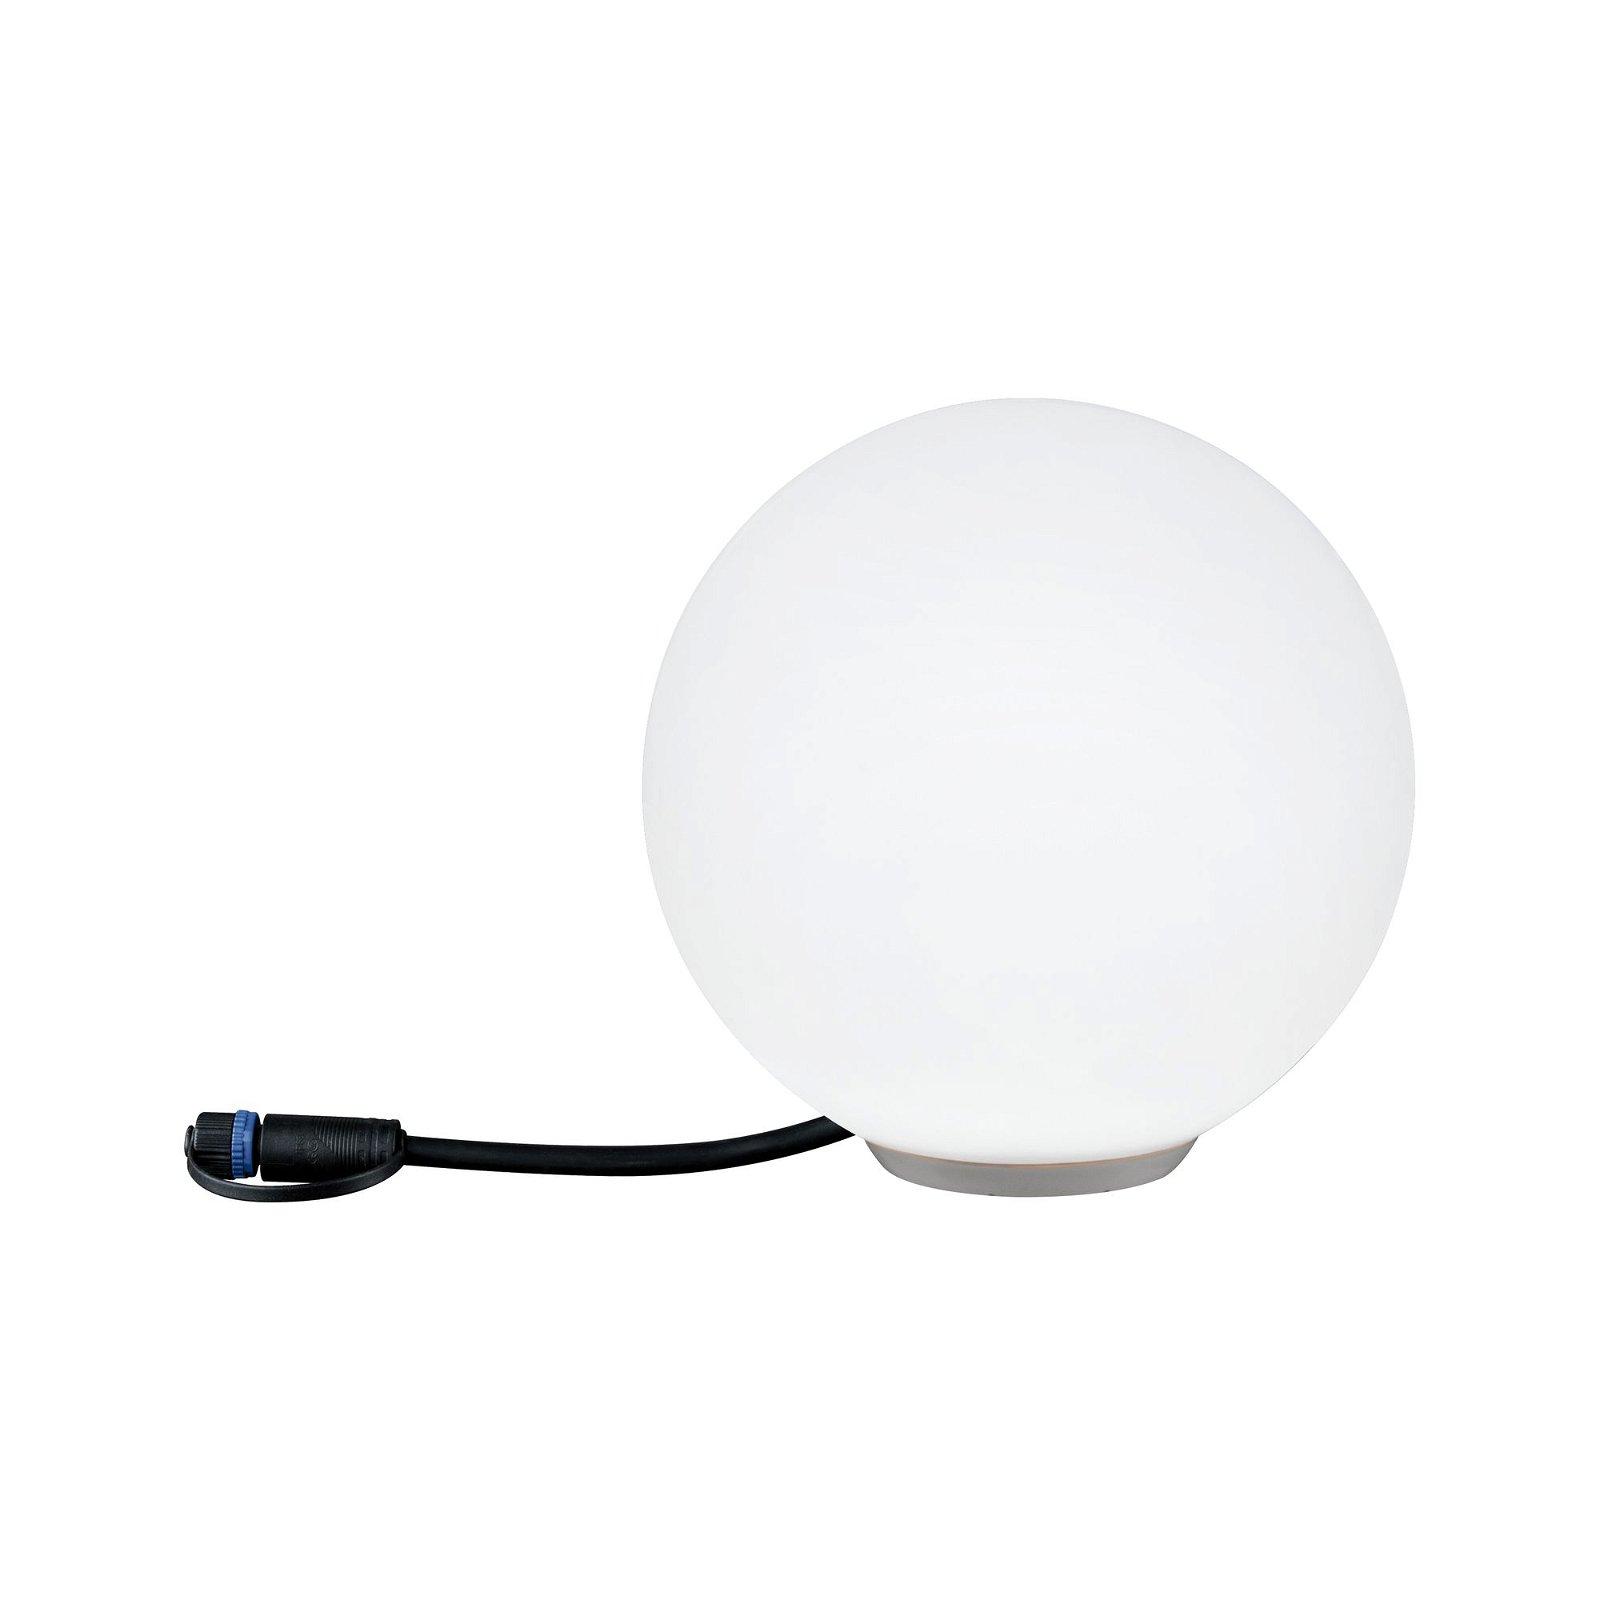 Plug & Shine Objet lumineux LED Smart Home Zigbee Globe 200mm IP65 RGBW 2,8W Blanc